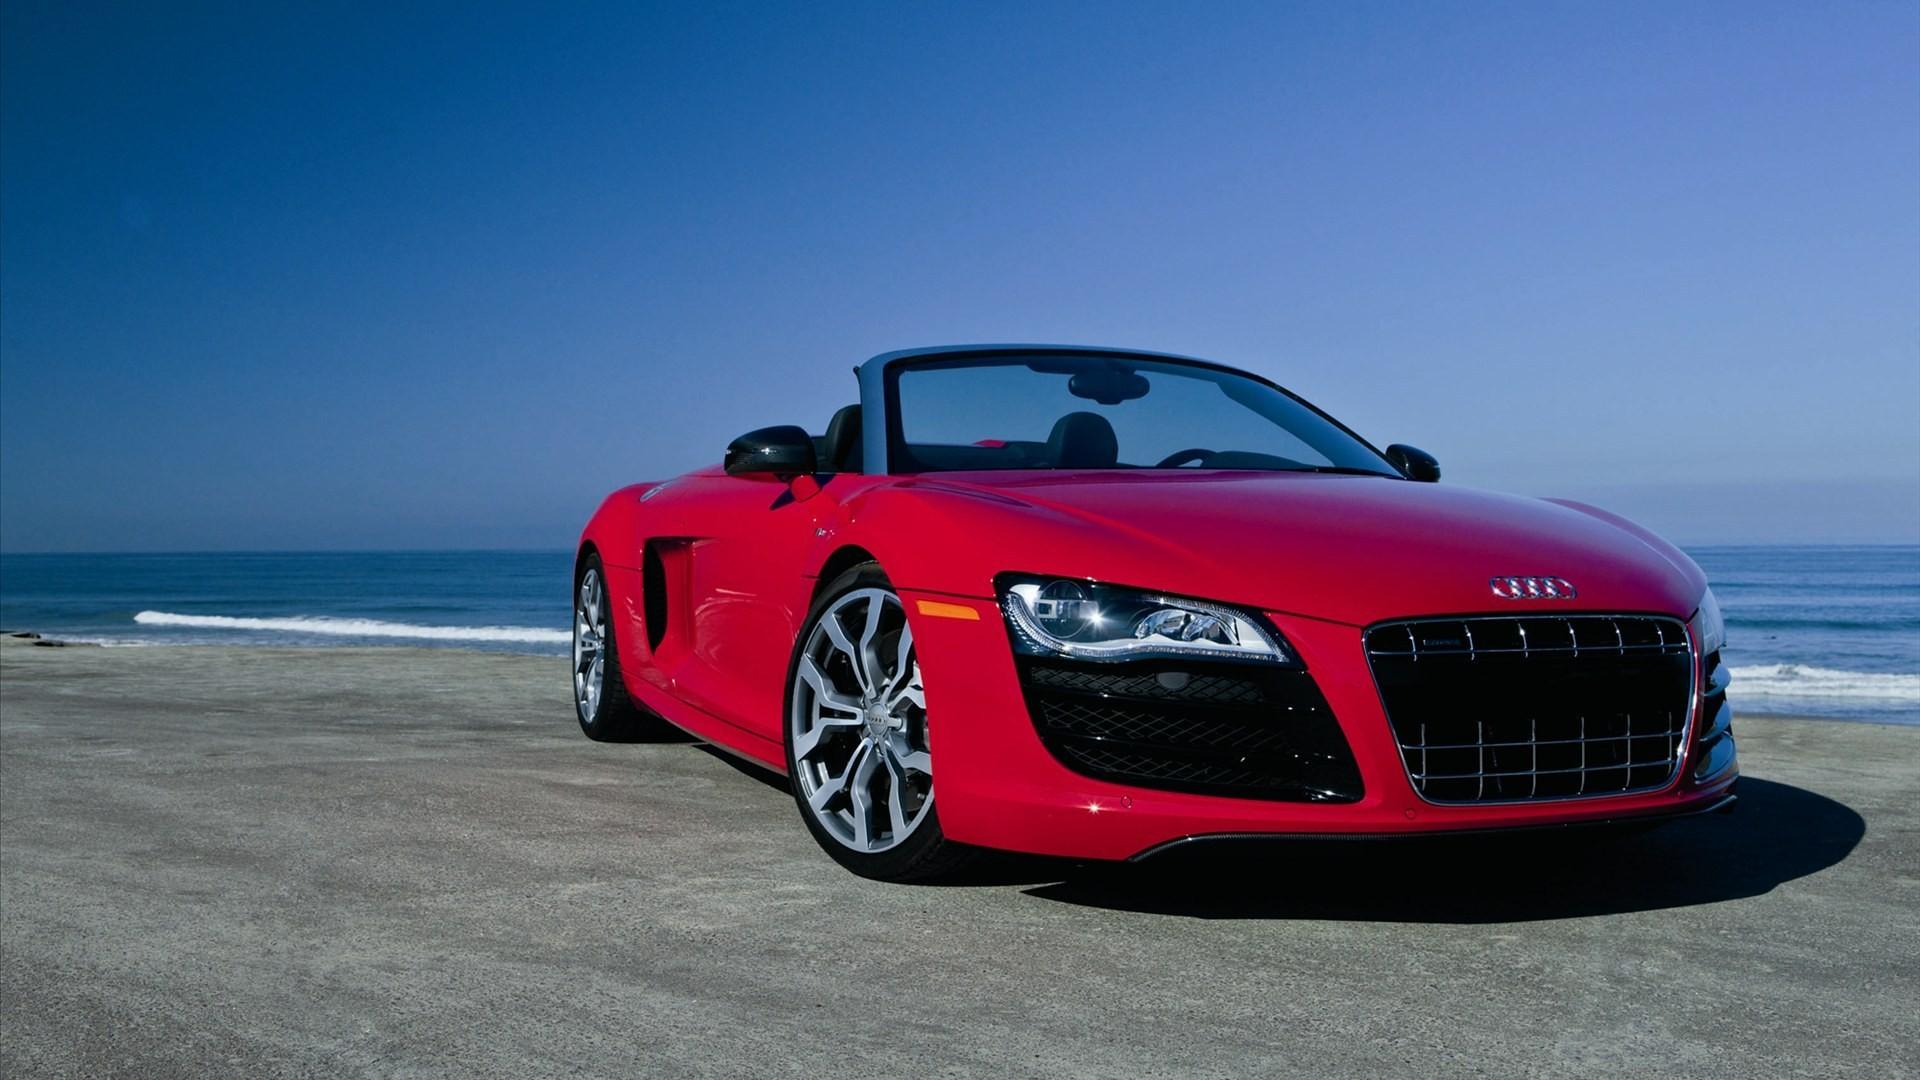 Free Download Audi R8 Gt Spyder Hd Desktop Wallpaper Hd Desktop Images, Photos, Reviews